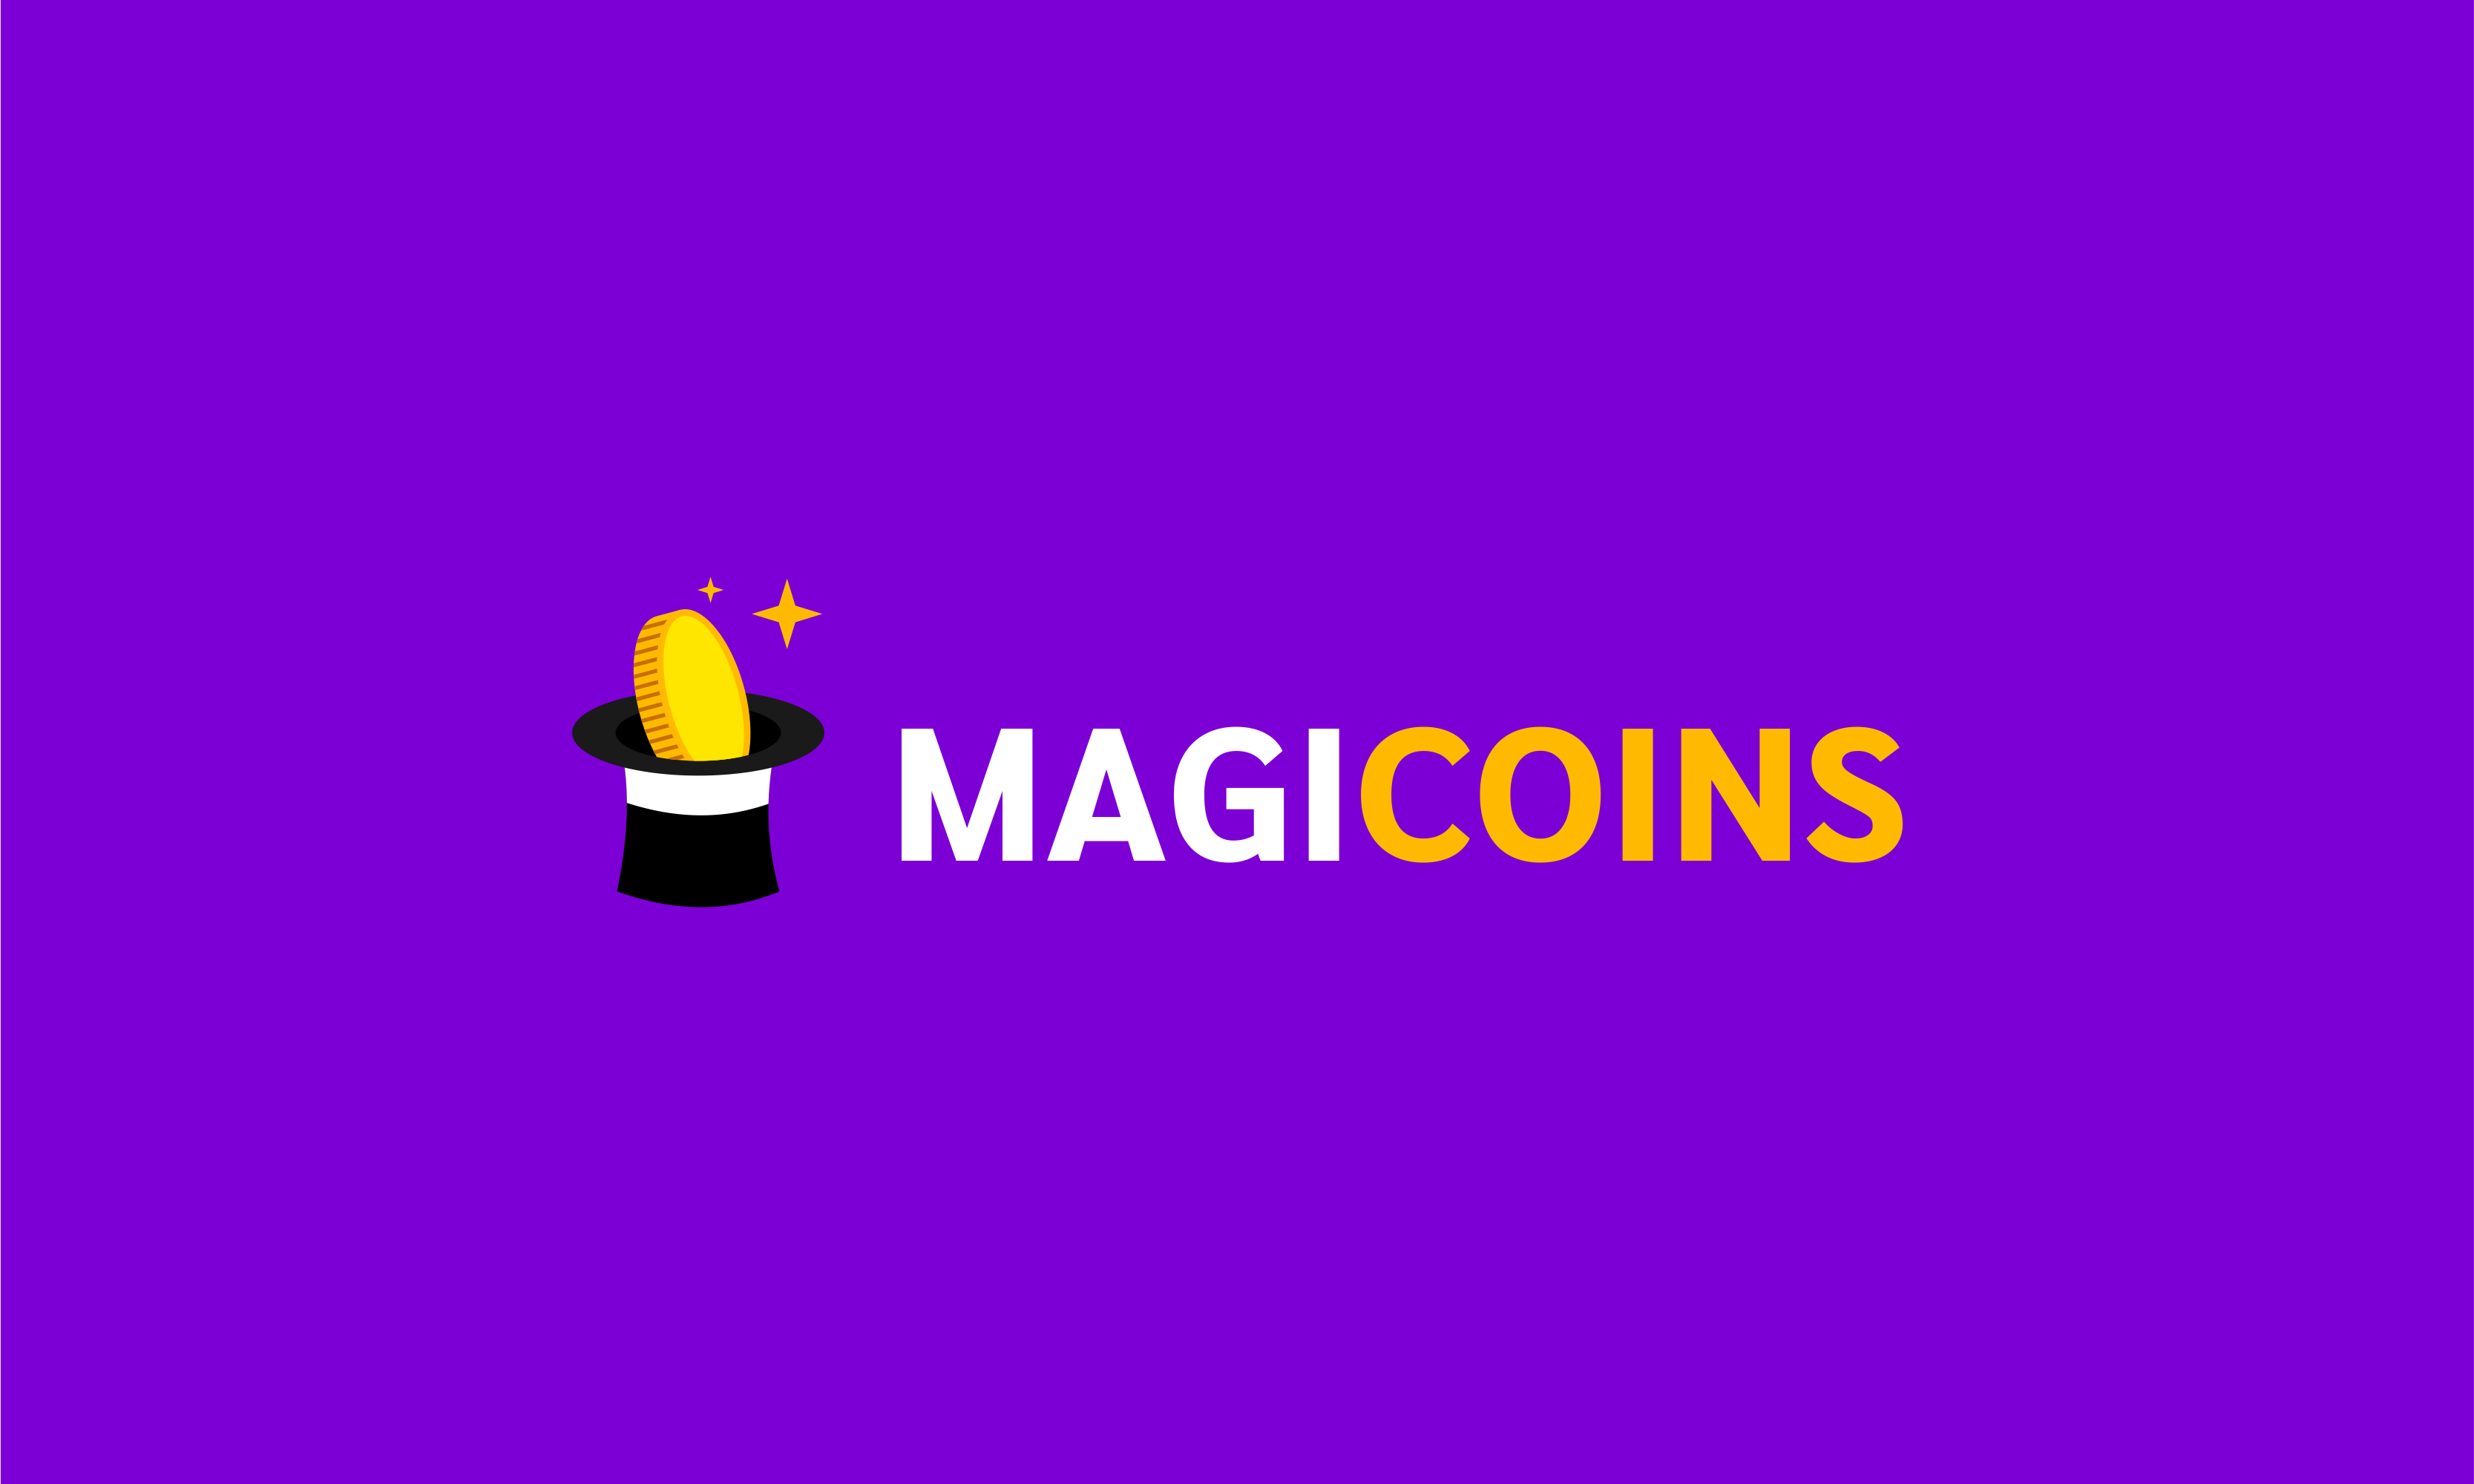 Magicoins